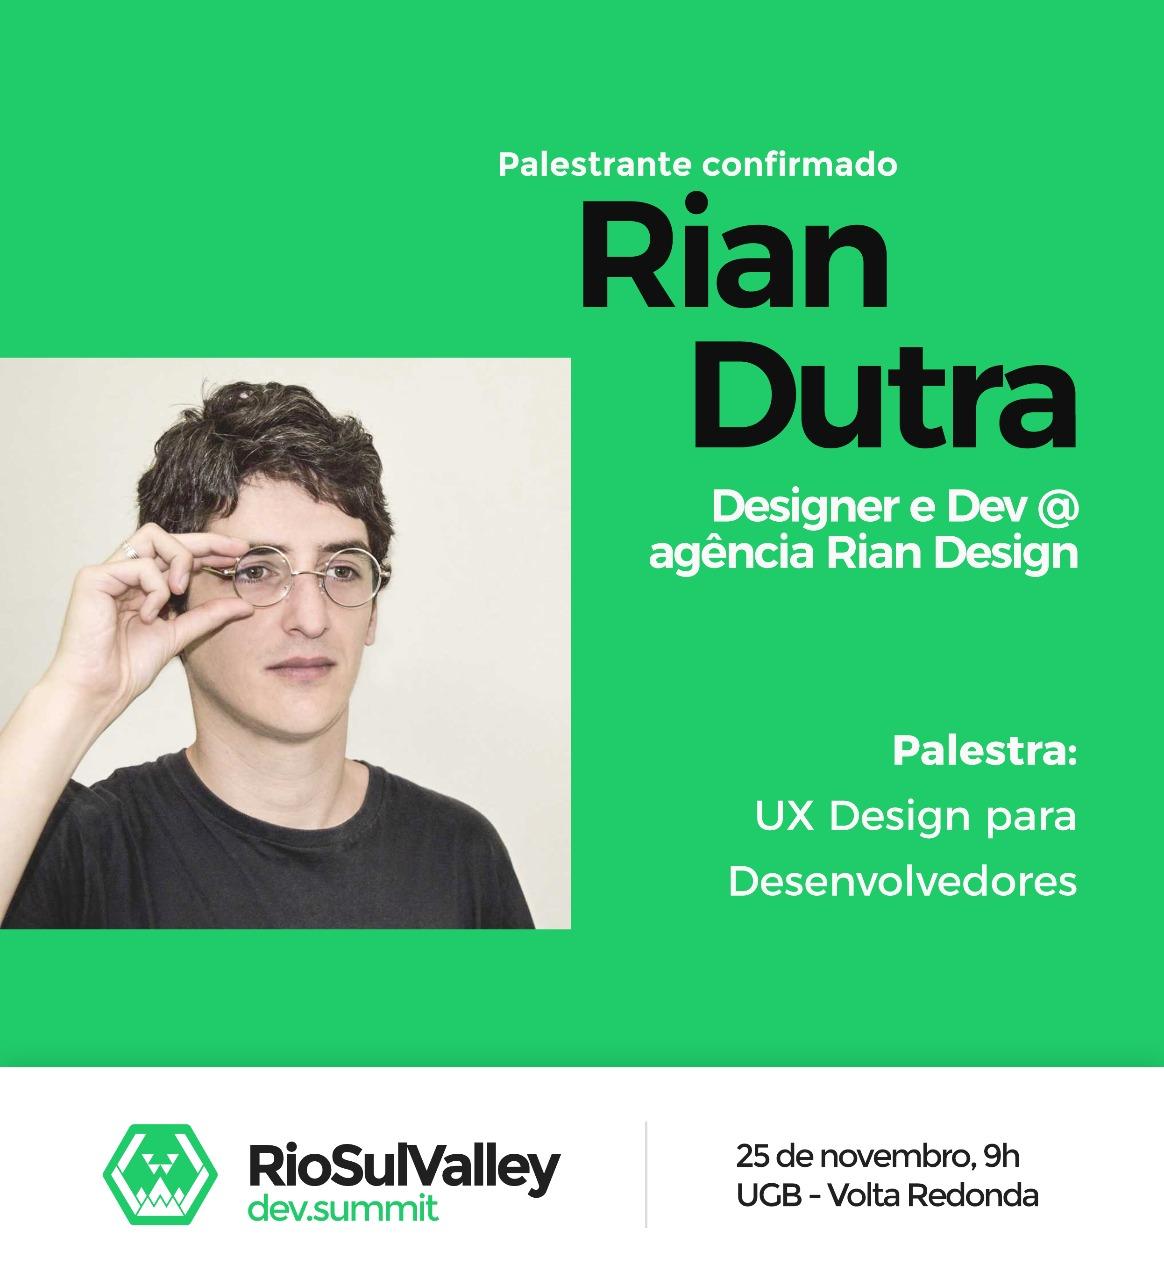 Rio Sul Valley Dev Summit 2017 - Rian Dutra